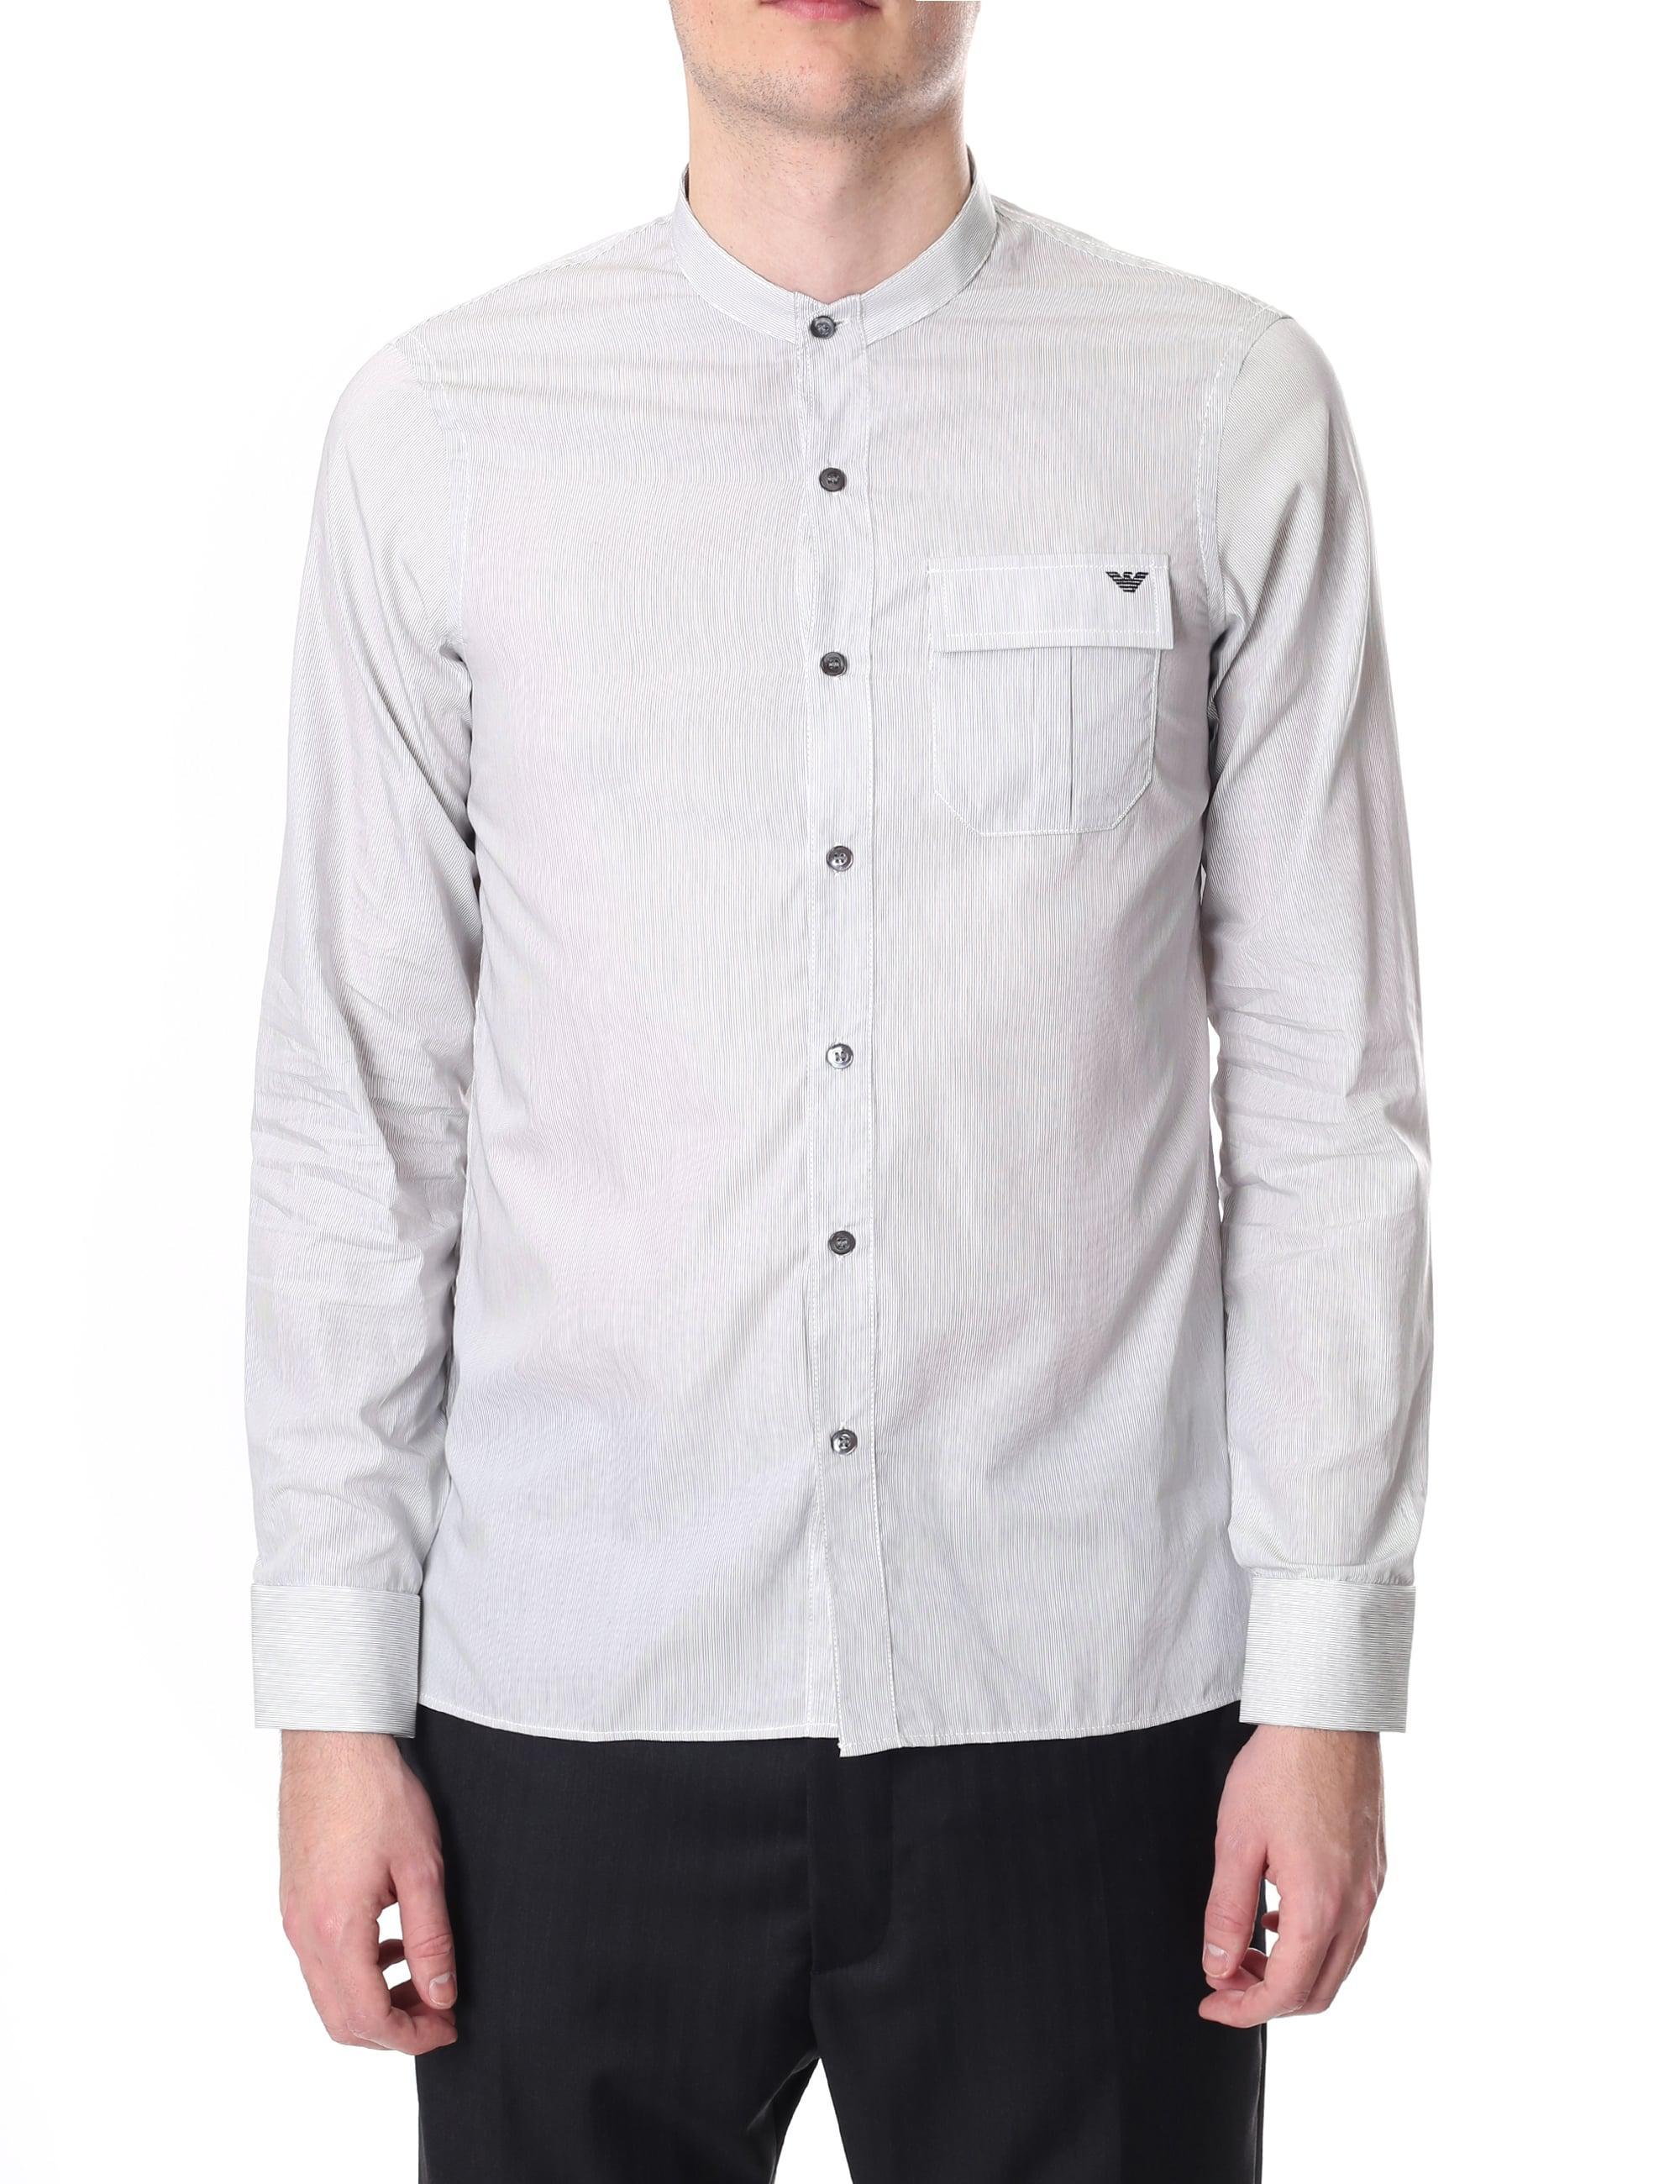 7662a65263 Emporio Armani. Men s Regular Fit Long Sleeve Shirt Stripe Optical White   Black